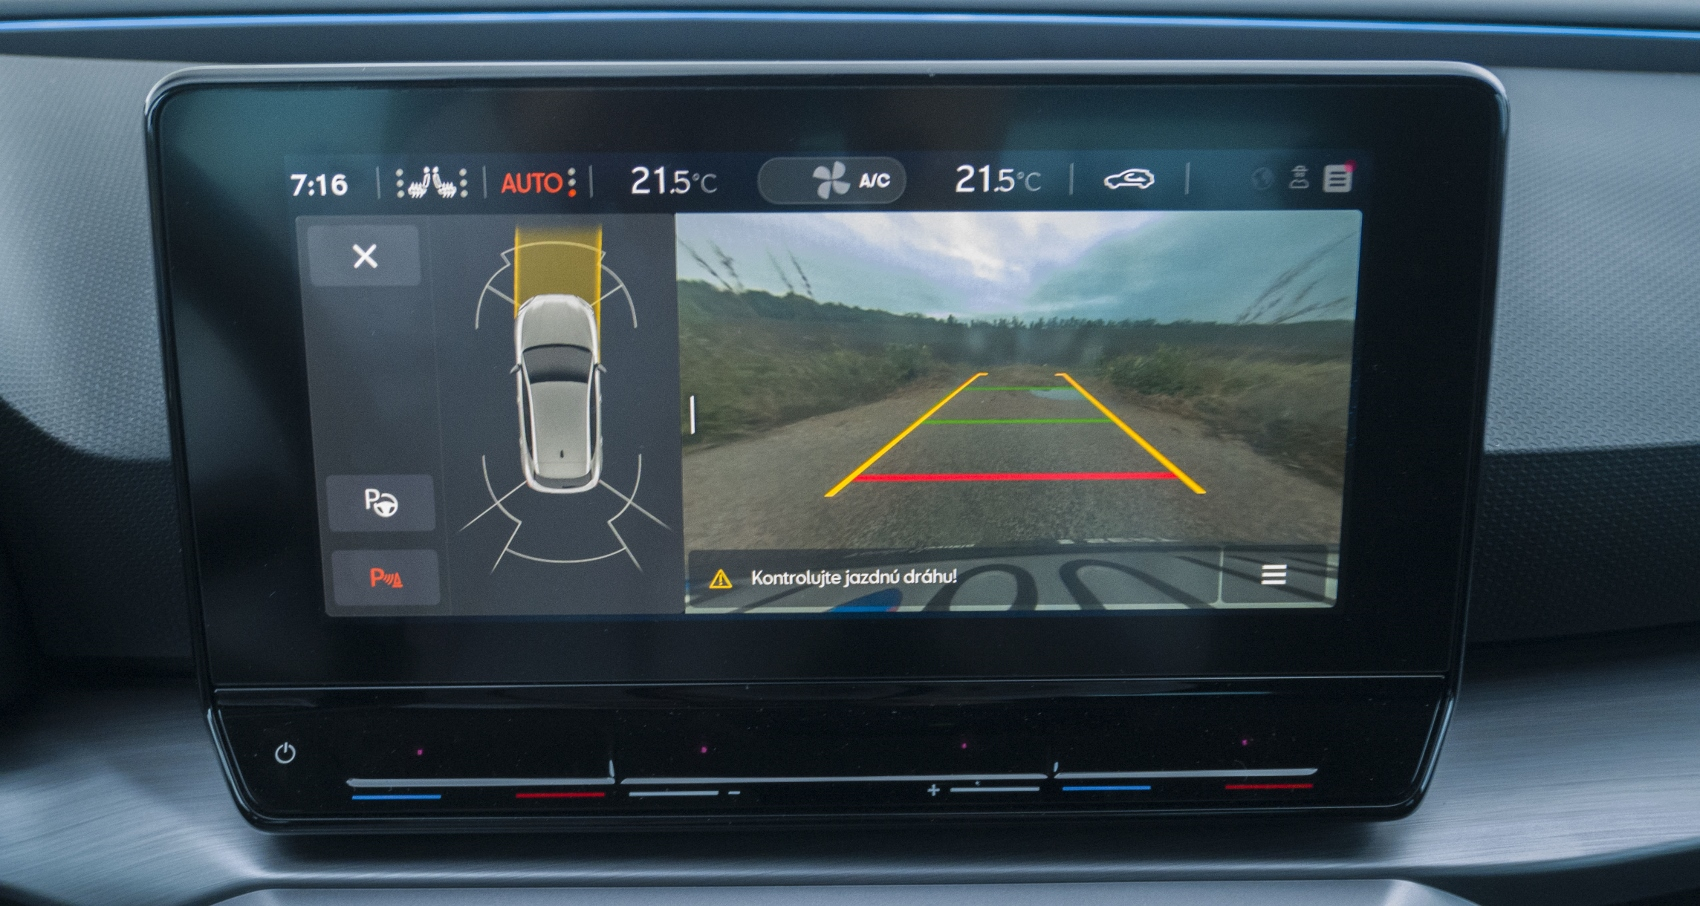 Test: Nový Seat Leon láka na moderné technológie  E2nOkNLEPO seat-leon-35